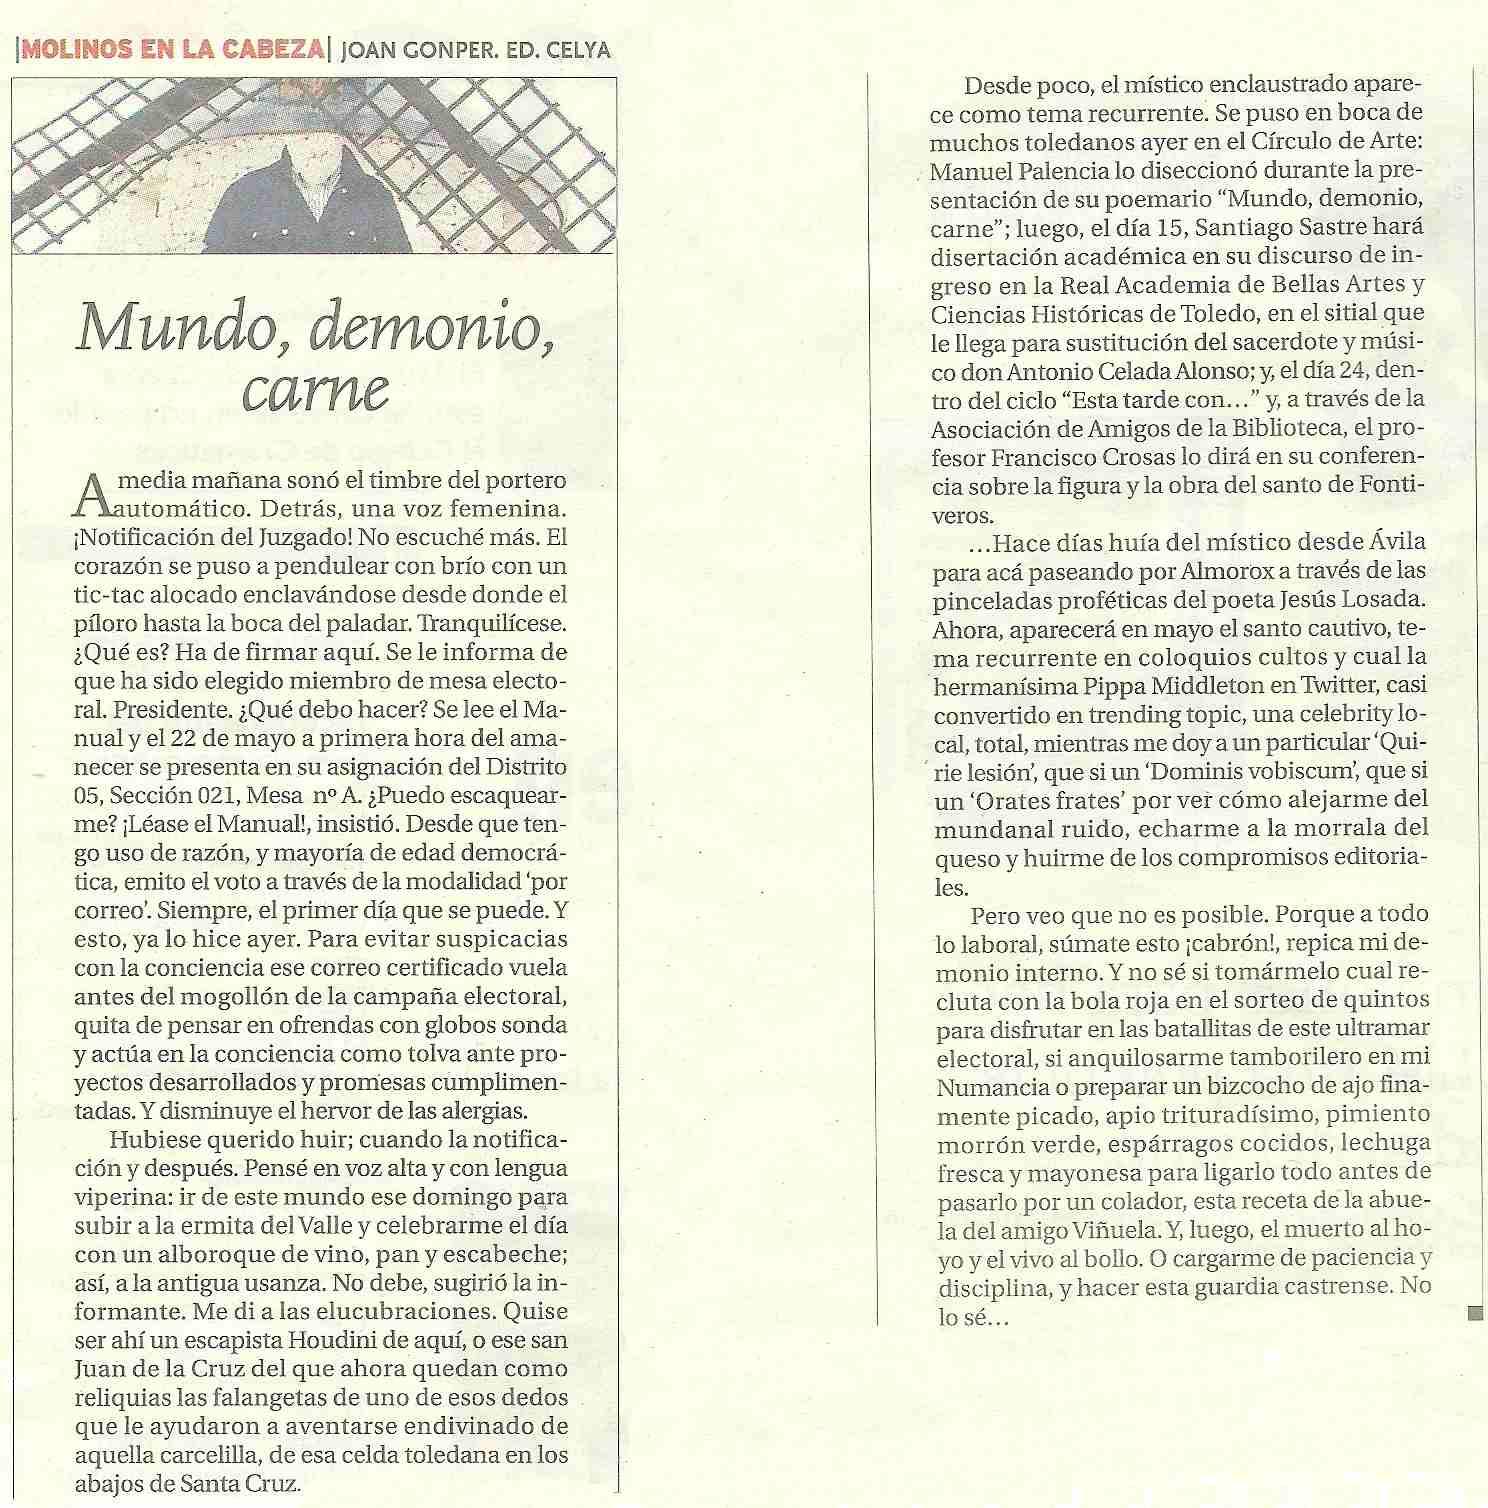 LA TRIBUNA DE TOLEDO: Mundo, demonio, carne. Opinión.